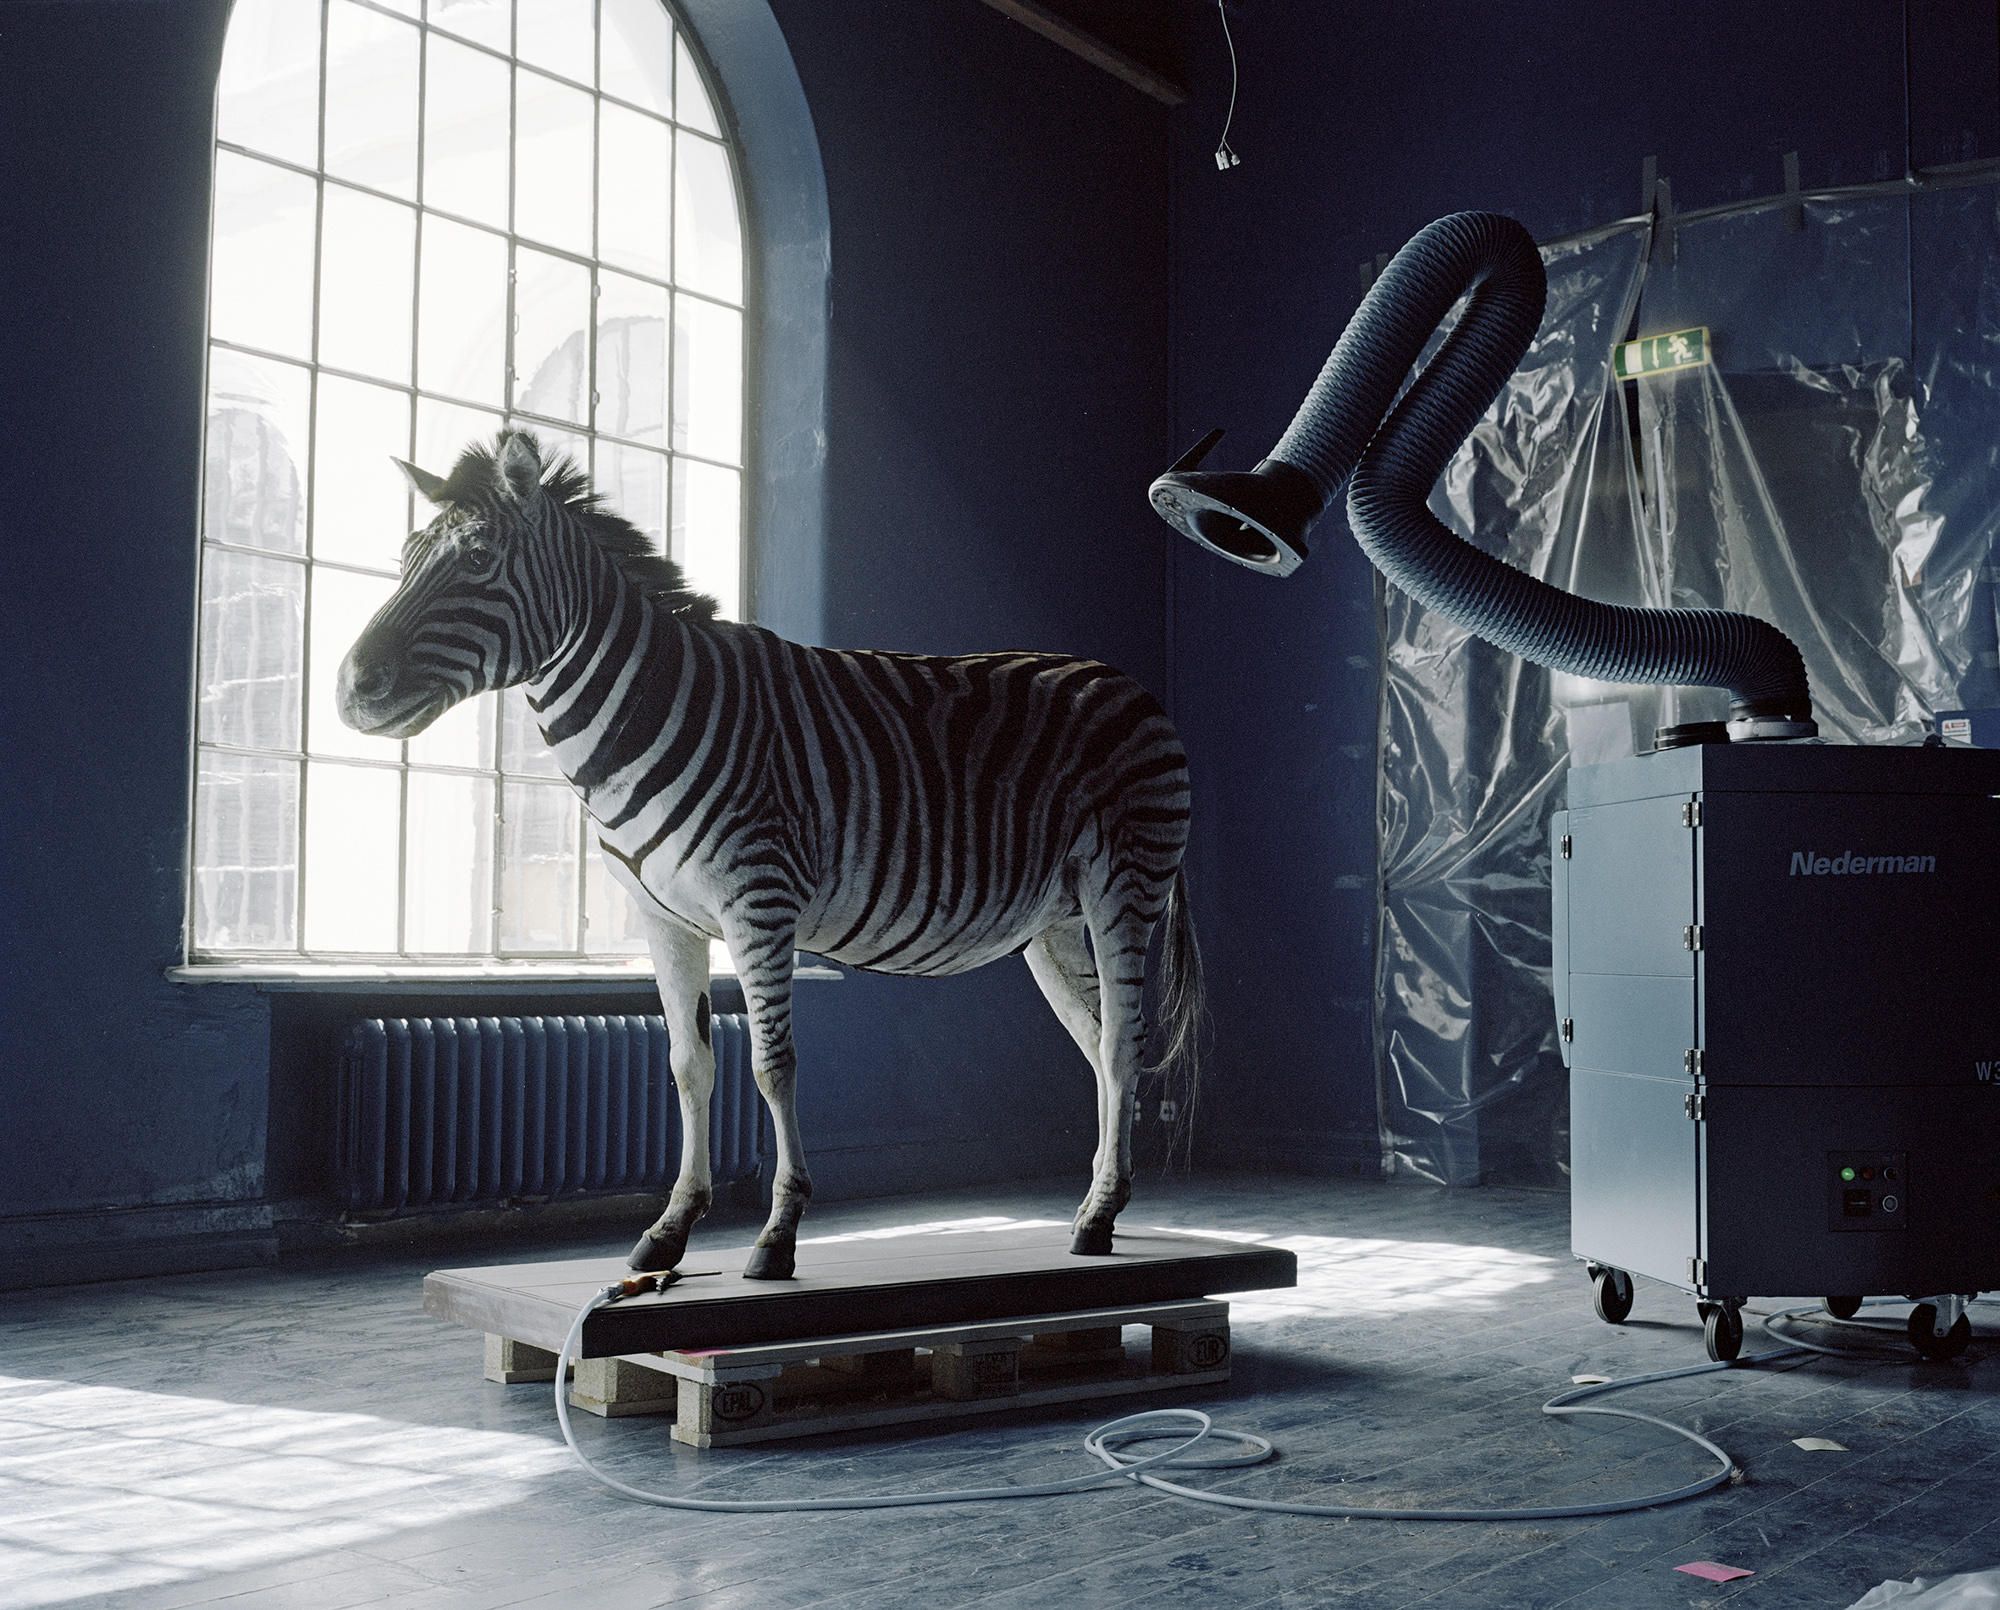 A Moveable Beast/Burchell's Zebra (equus burchellii)